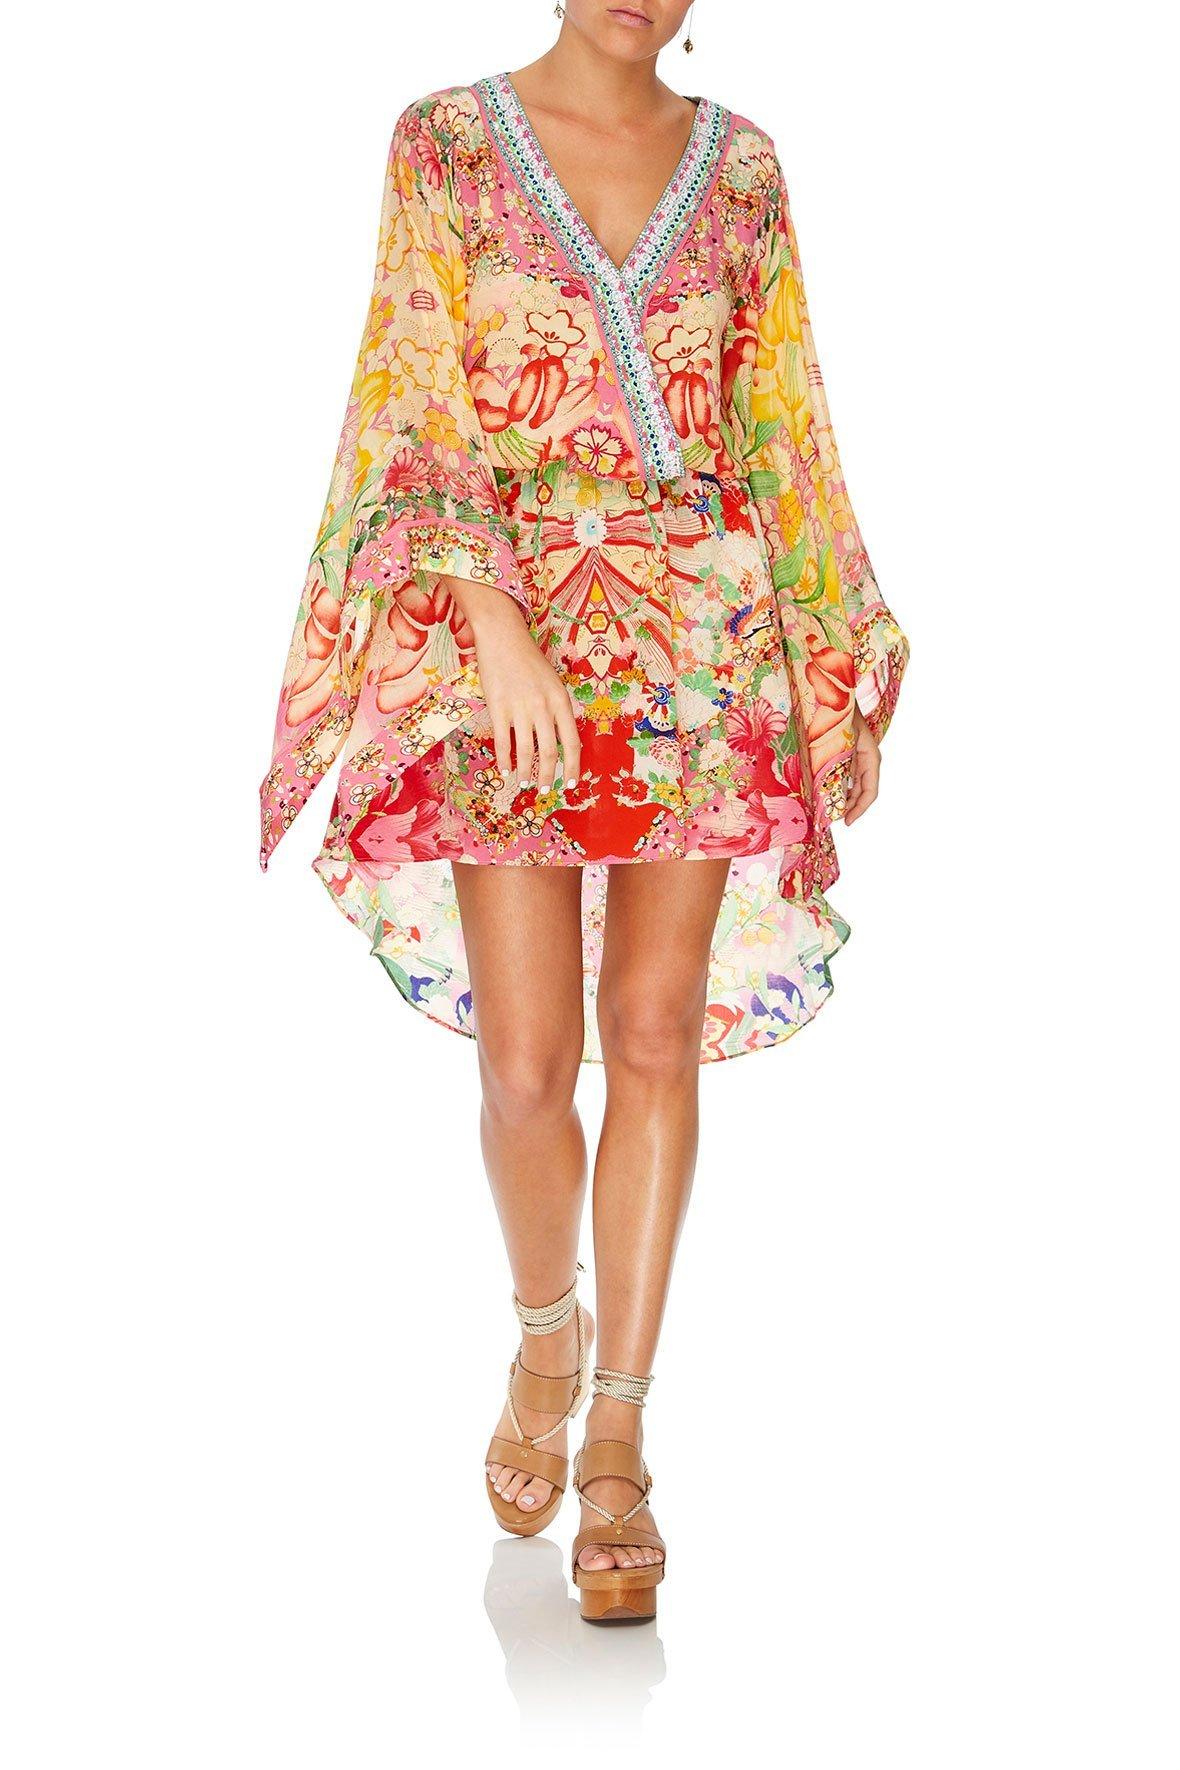 camilla_v_neck_kimono_dress_with_tie_kimono_kisses_1_1024x1024@2x